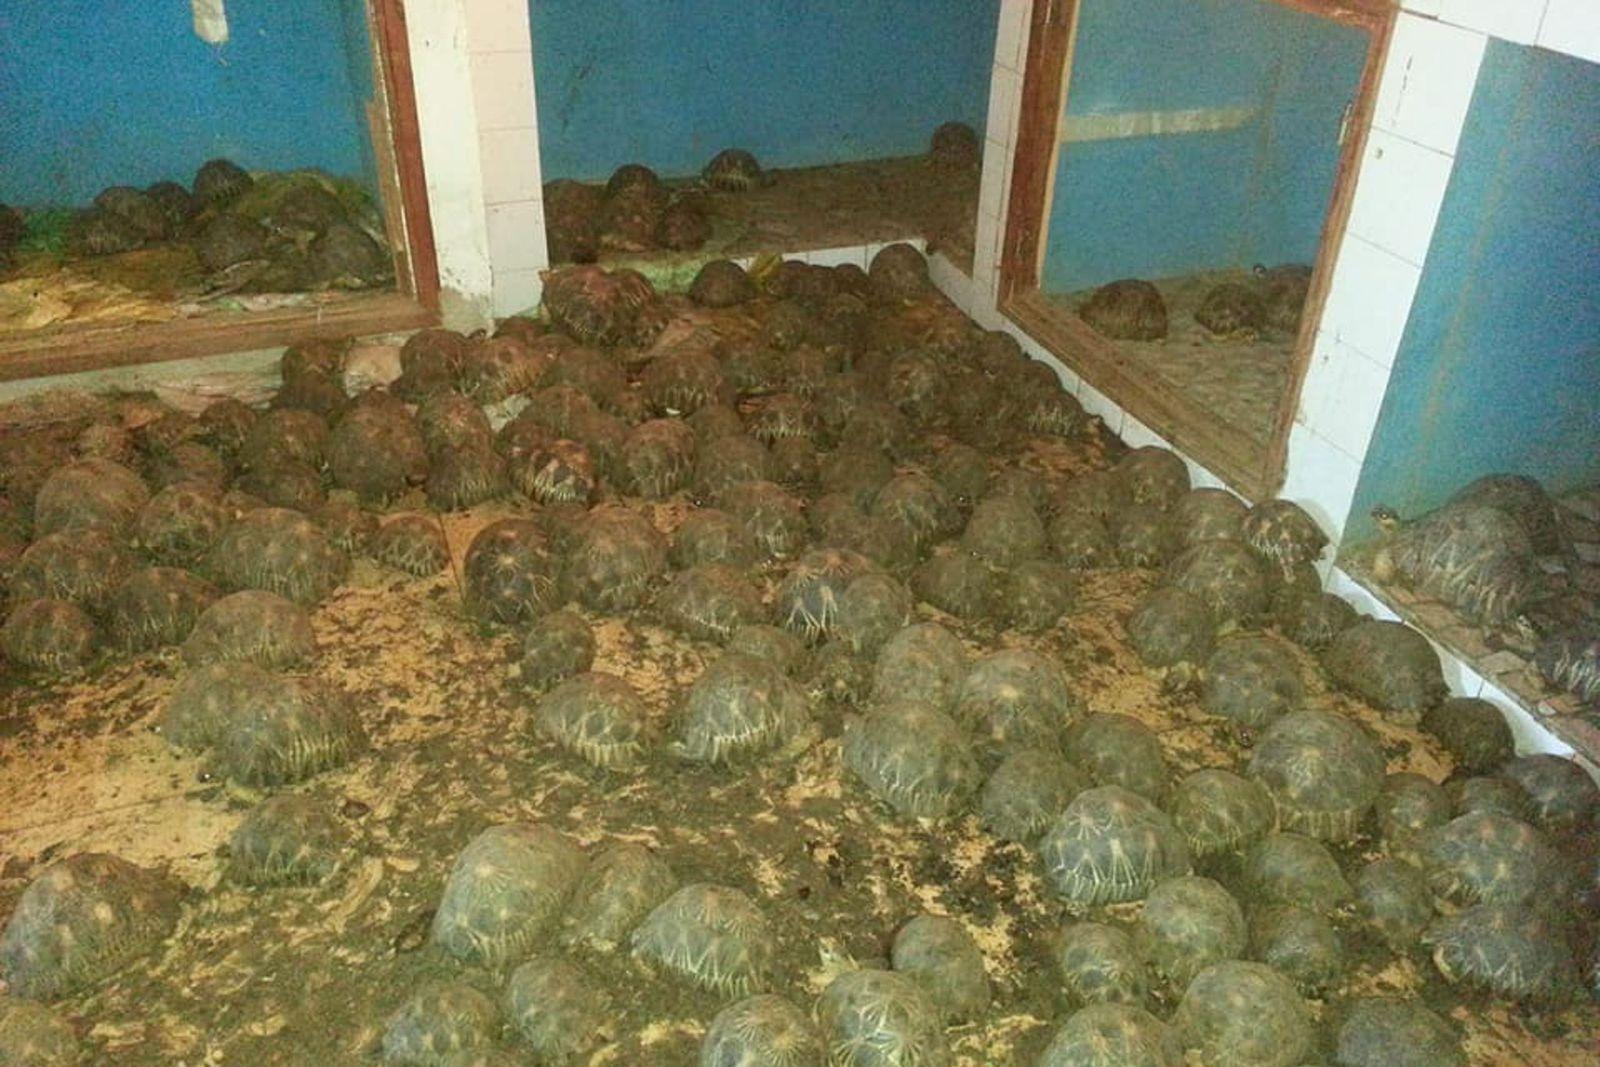 10.000 tortugas radiadas